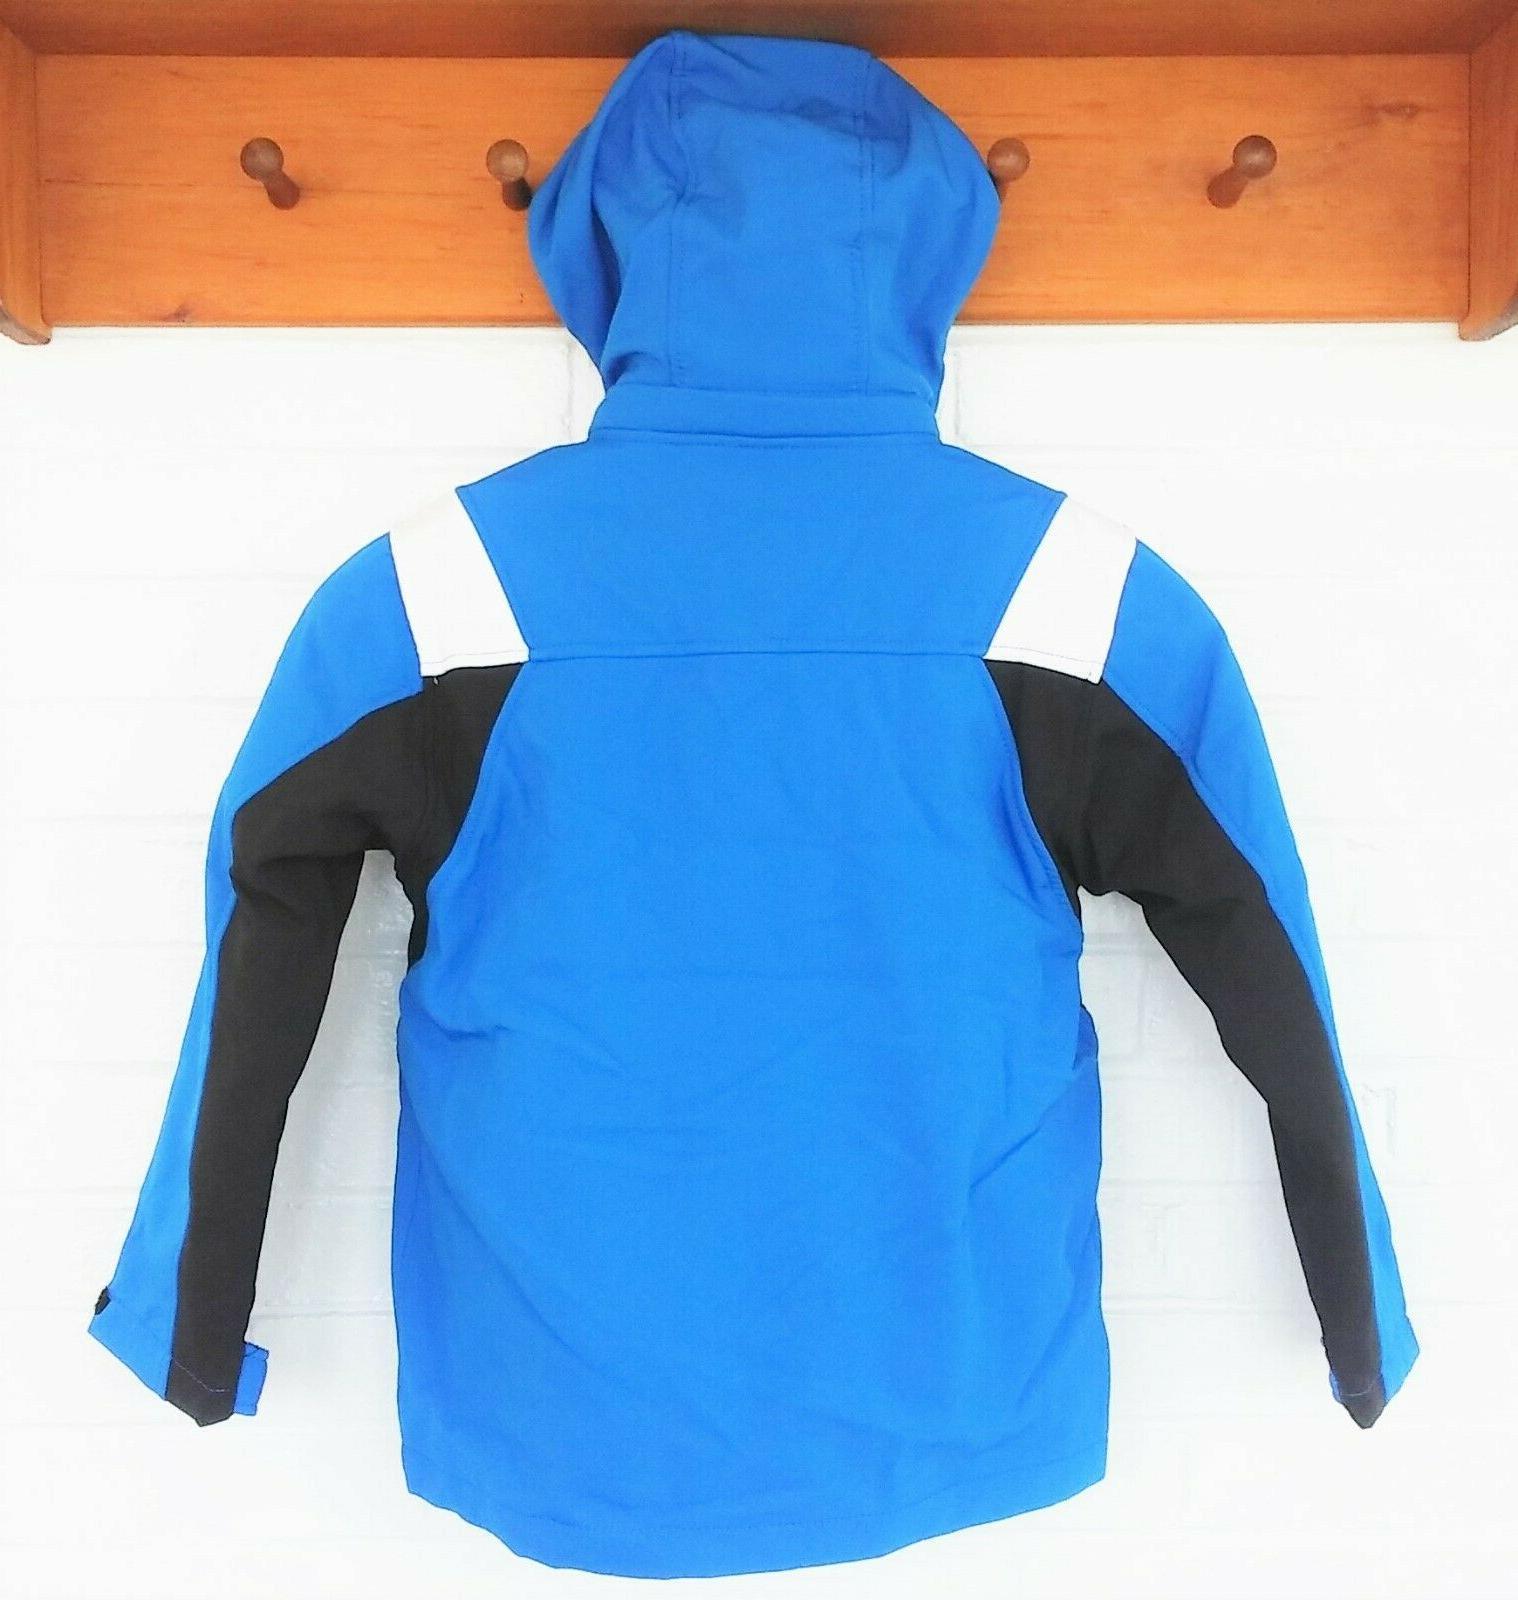 Reebok in 1 Winter Snowboard Blue White Boys Size Small NWT